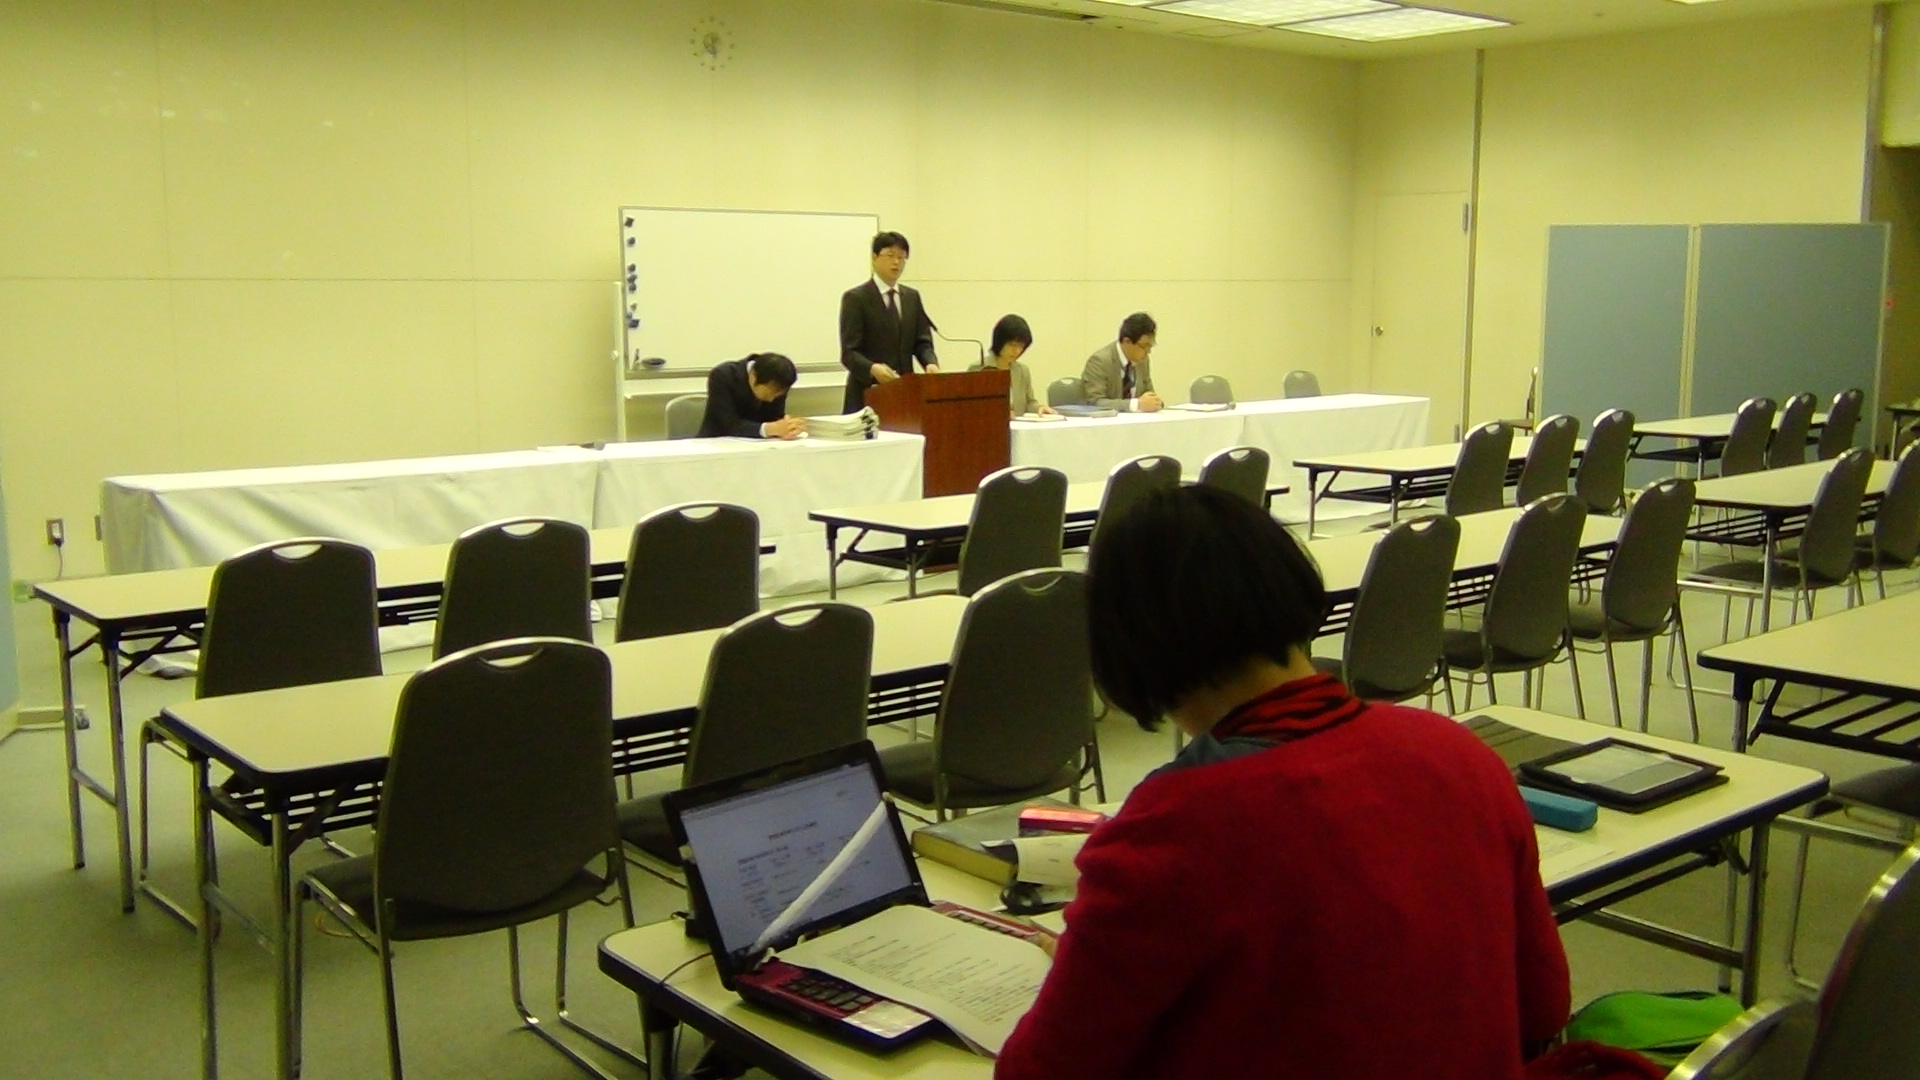 http://daily.magazine9.jp/m9/oshidori/DSC01498%5B1%5D.JPG